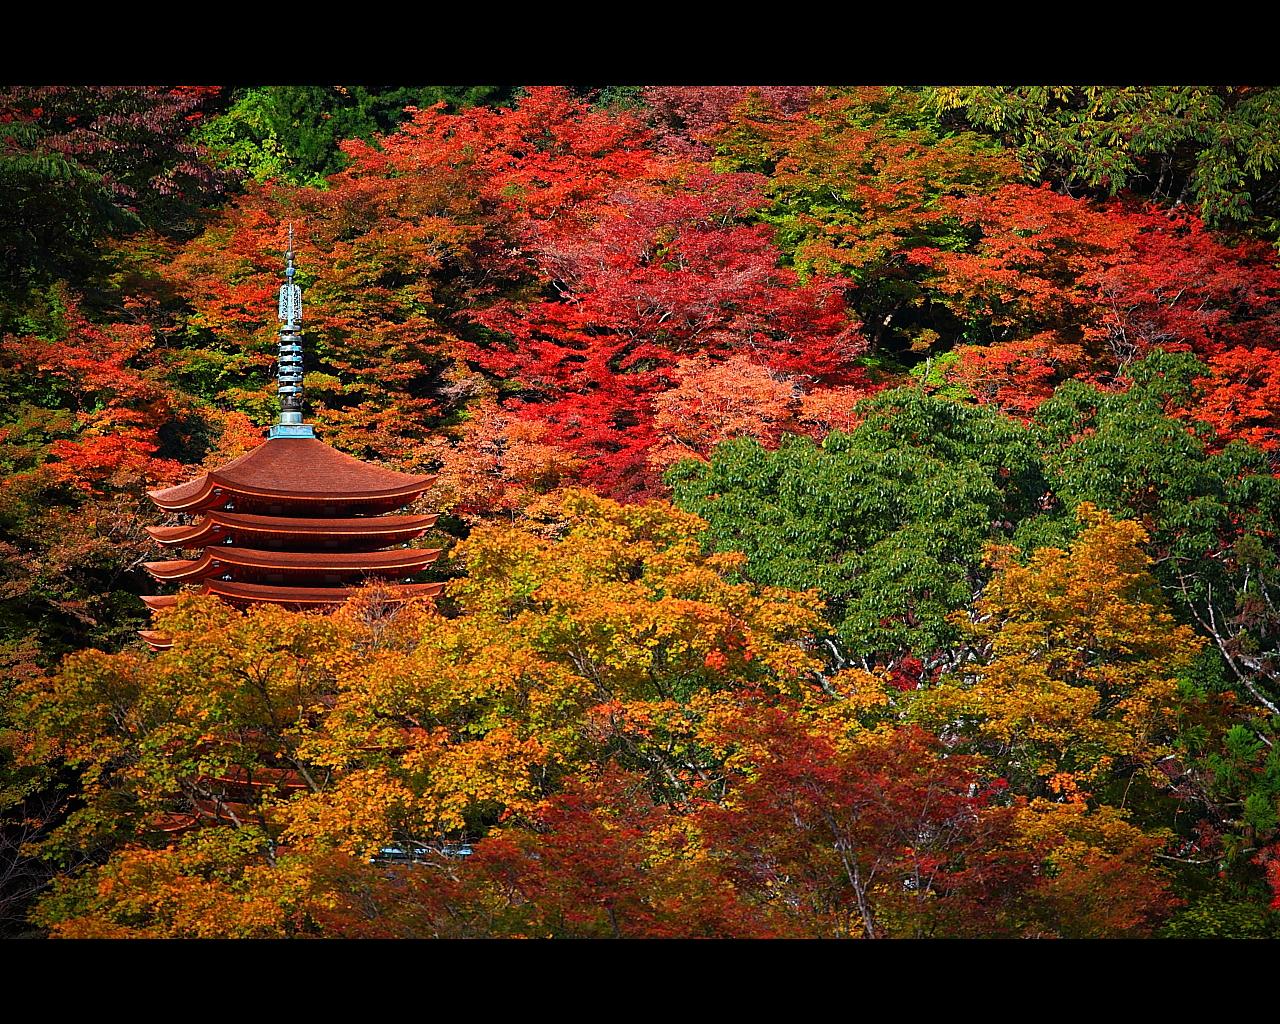 談山神社十三重塔と多武峰の紅葉...